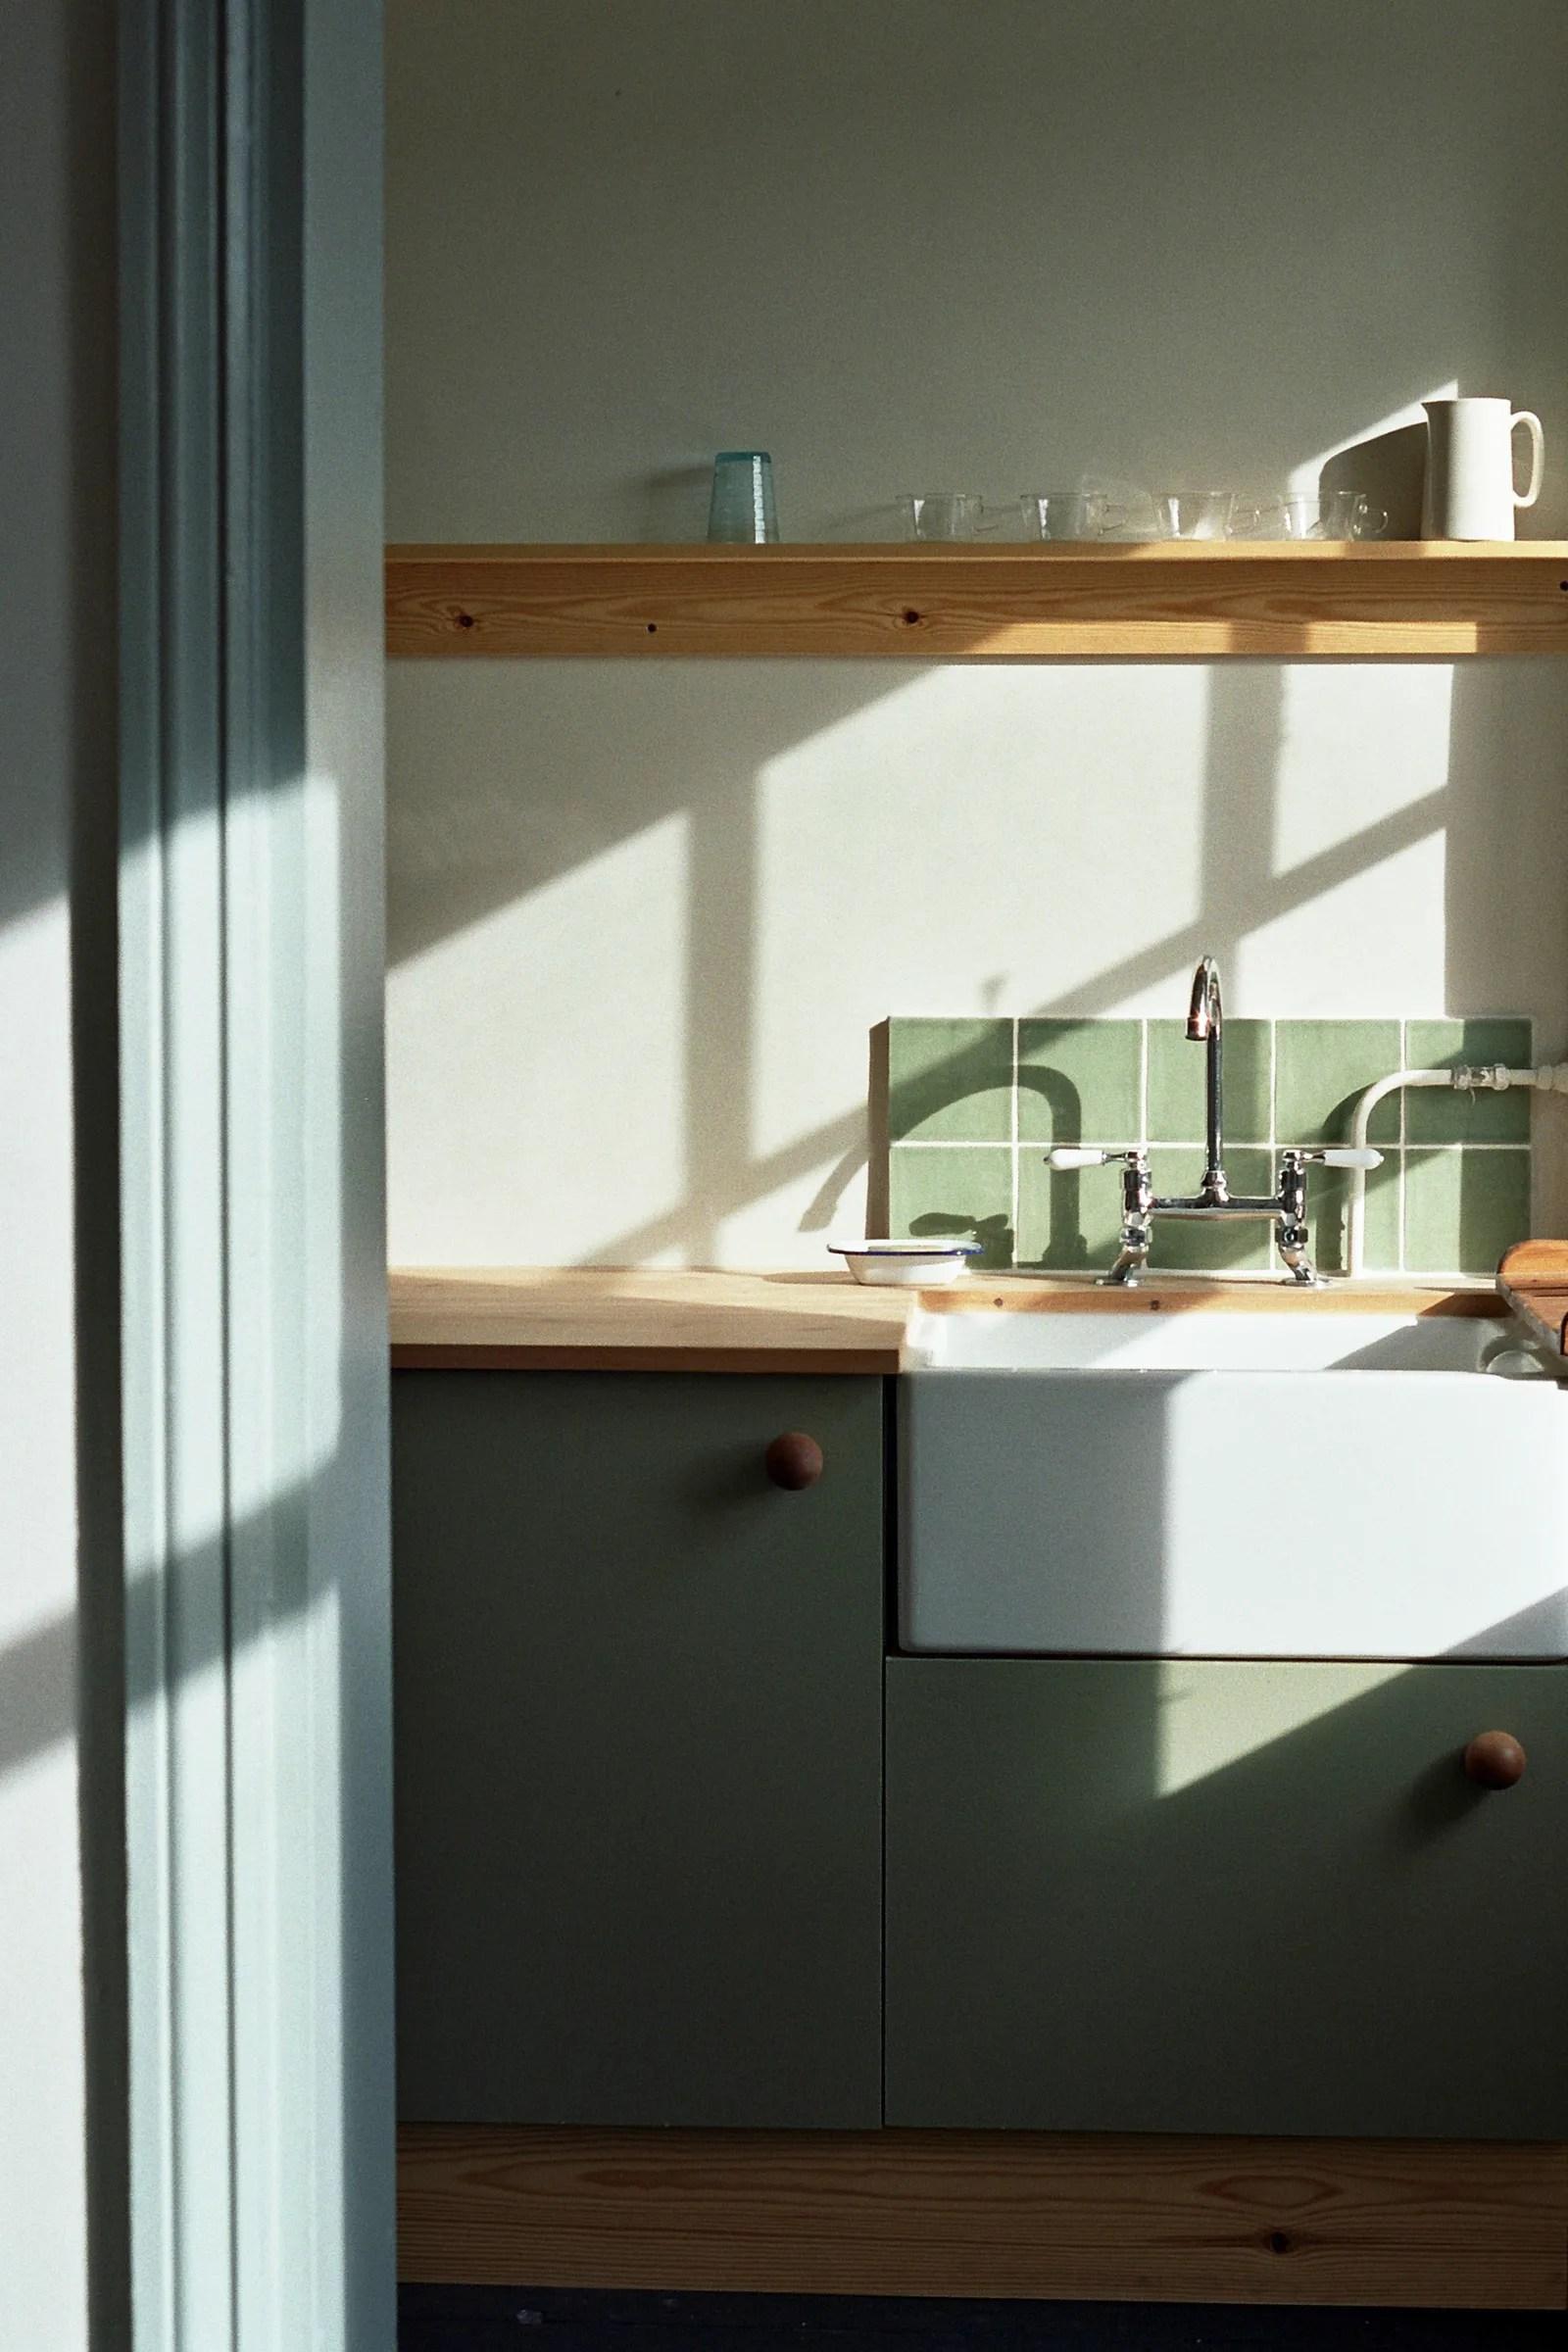 A Small Kitchen Backsplash Makes So Much Sense Architectural Digest